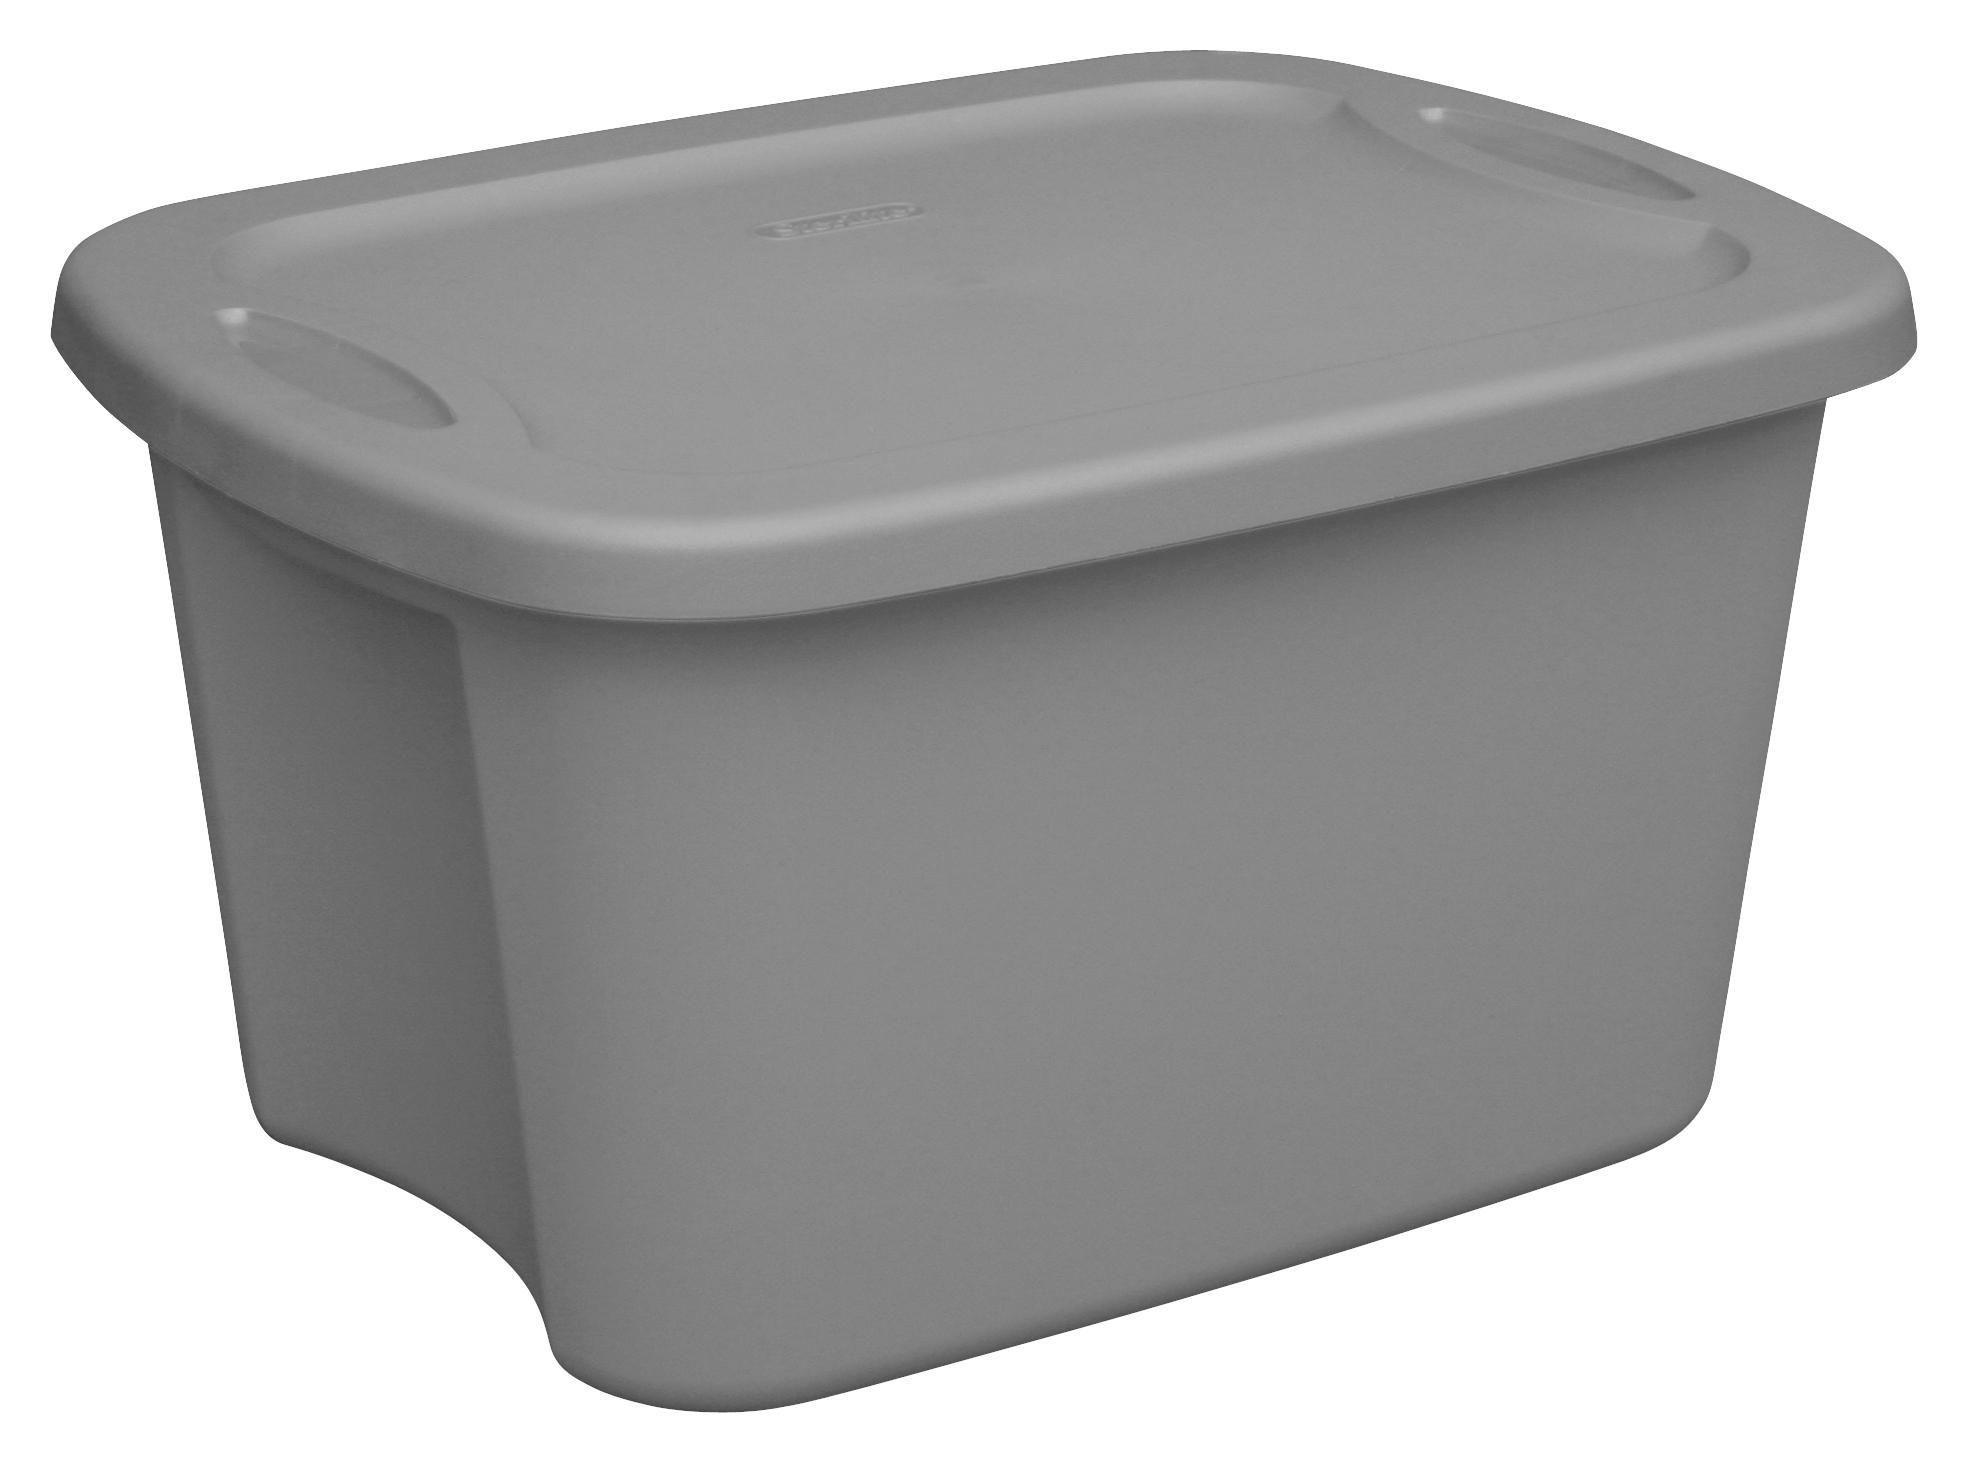 tub target less storage medium more ribbon pin turqu essentials room expect pay tubsroom storagestorage